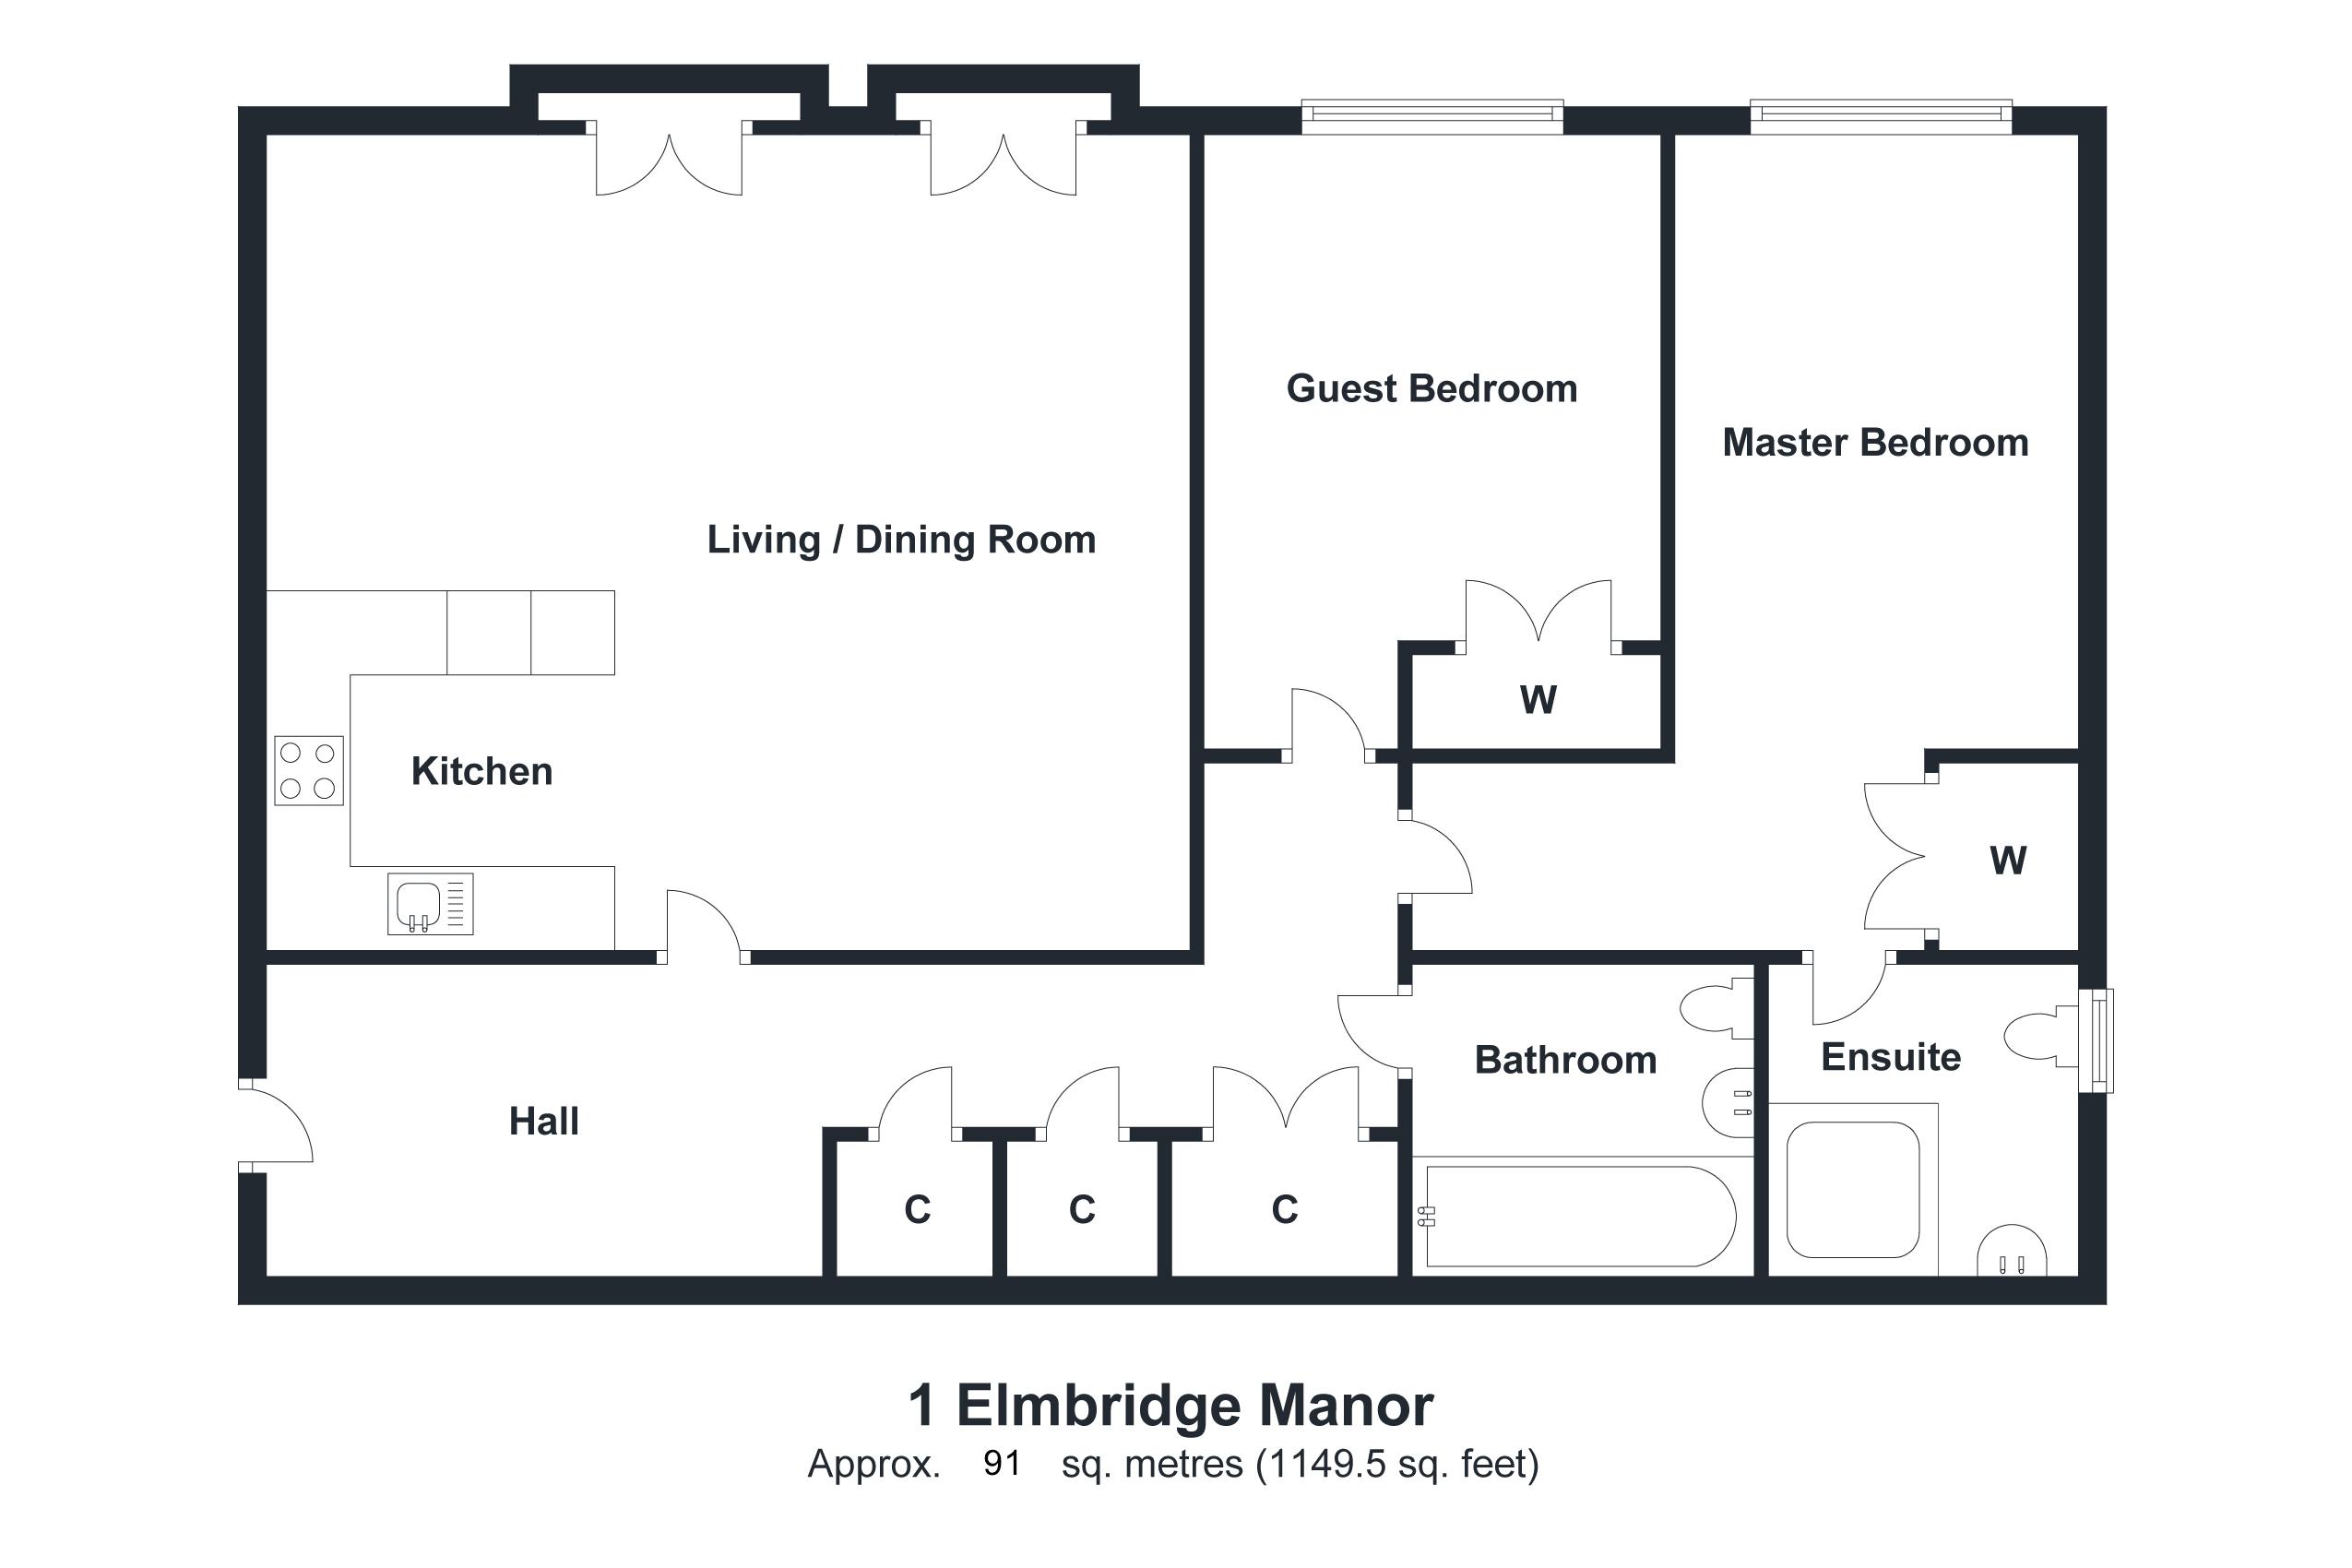 1 Elmbridge Manor Floorplan